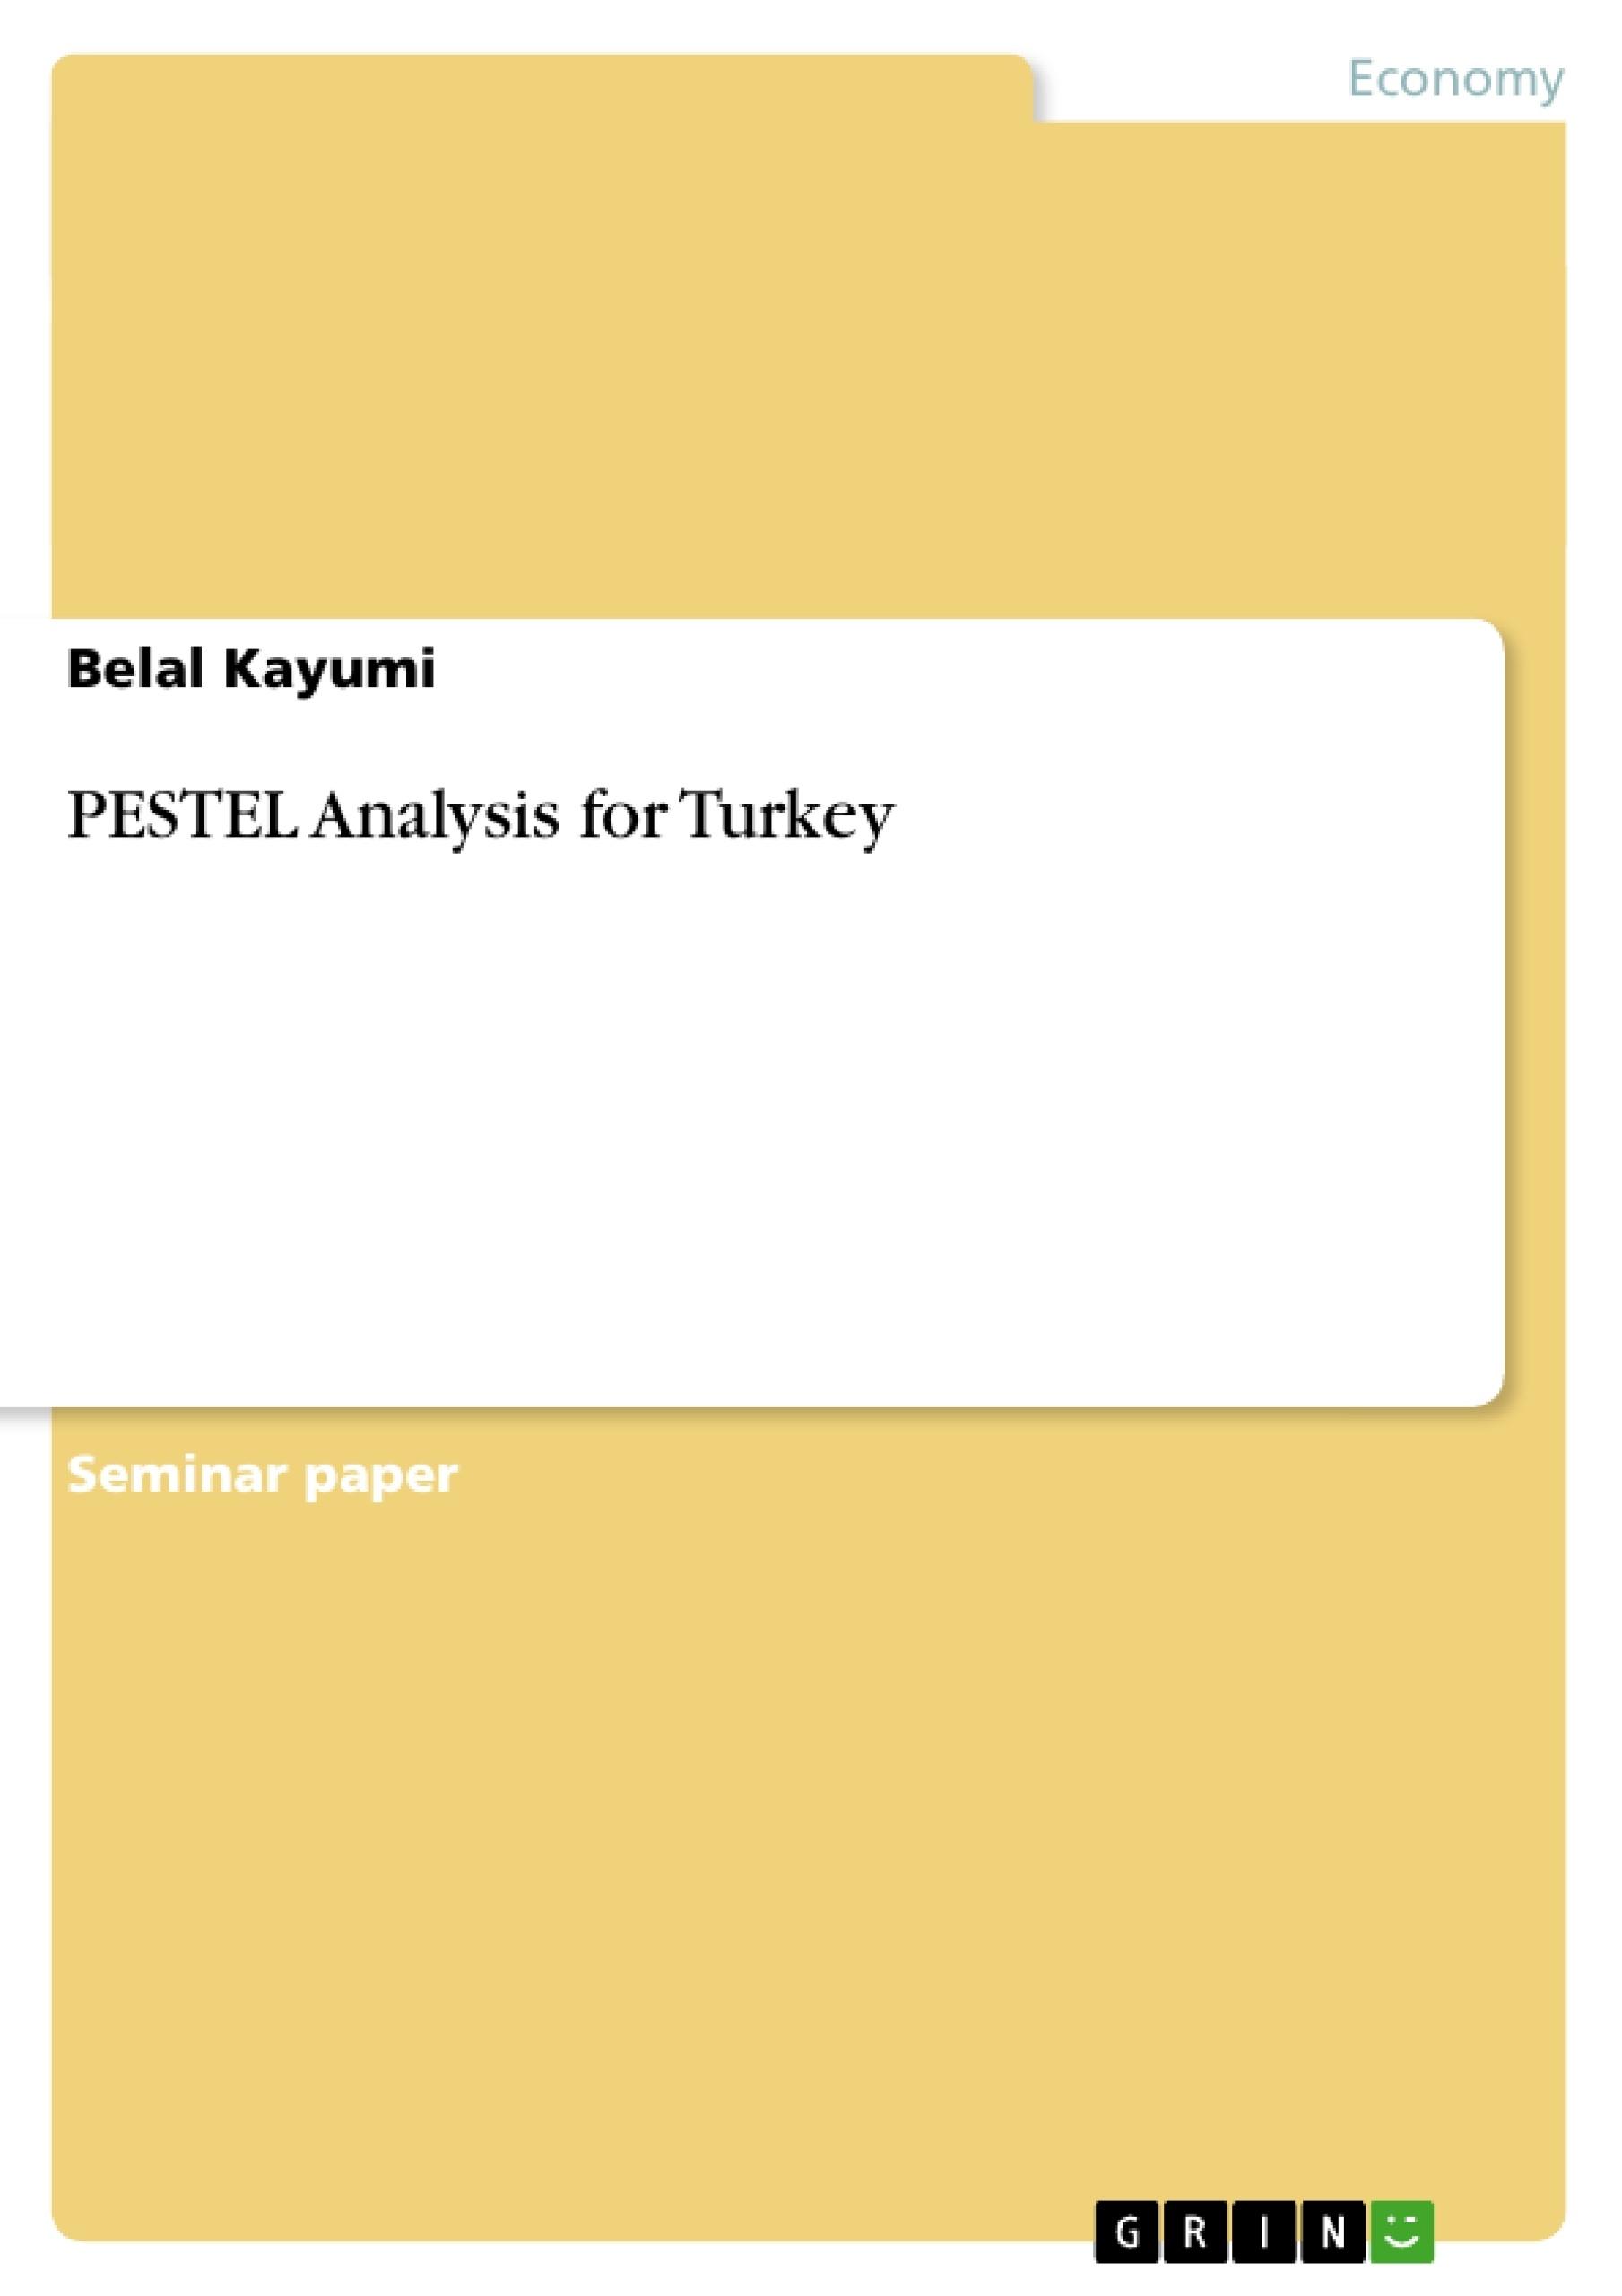 Title: PESTEL Analysis for Turkey